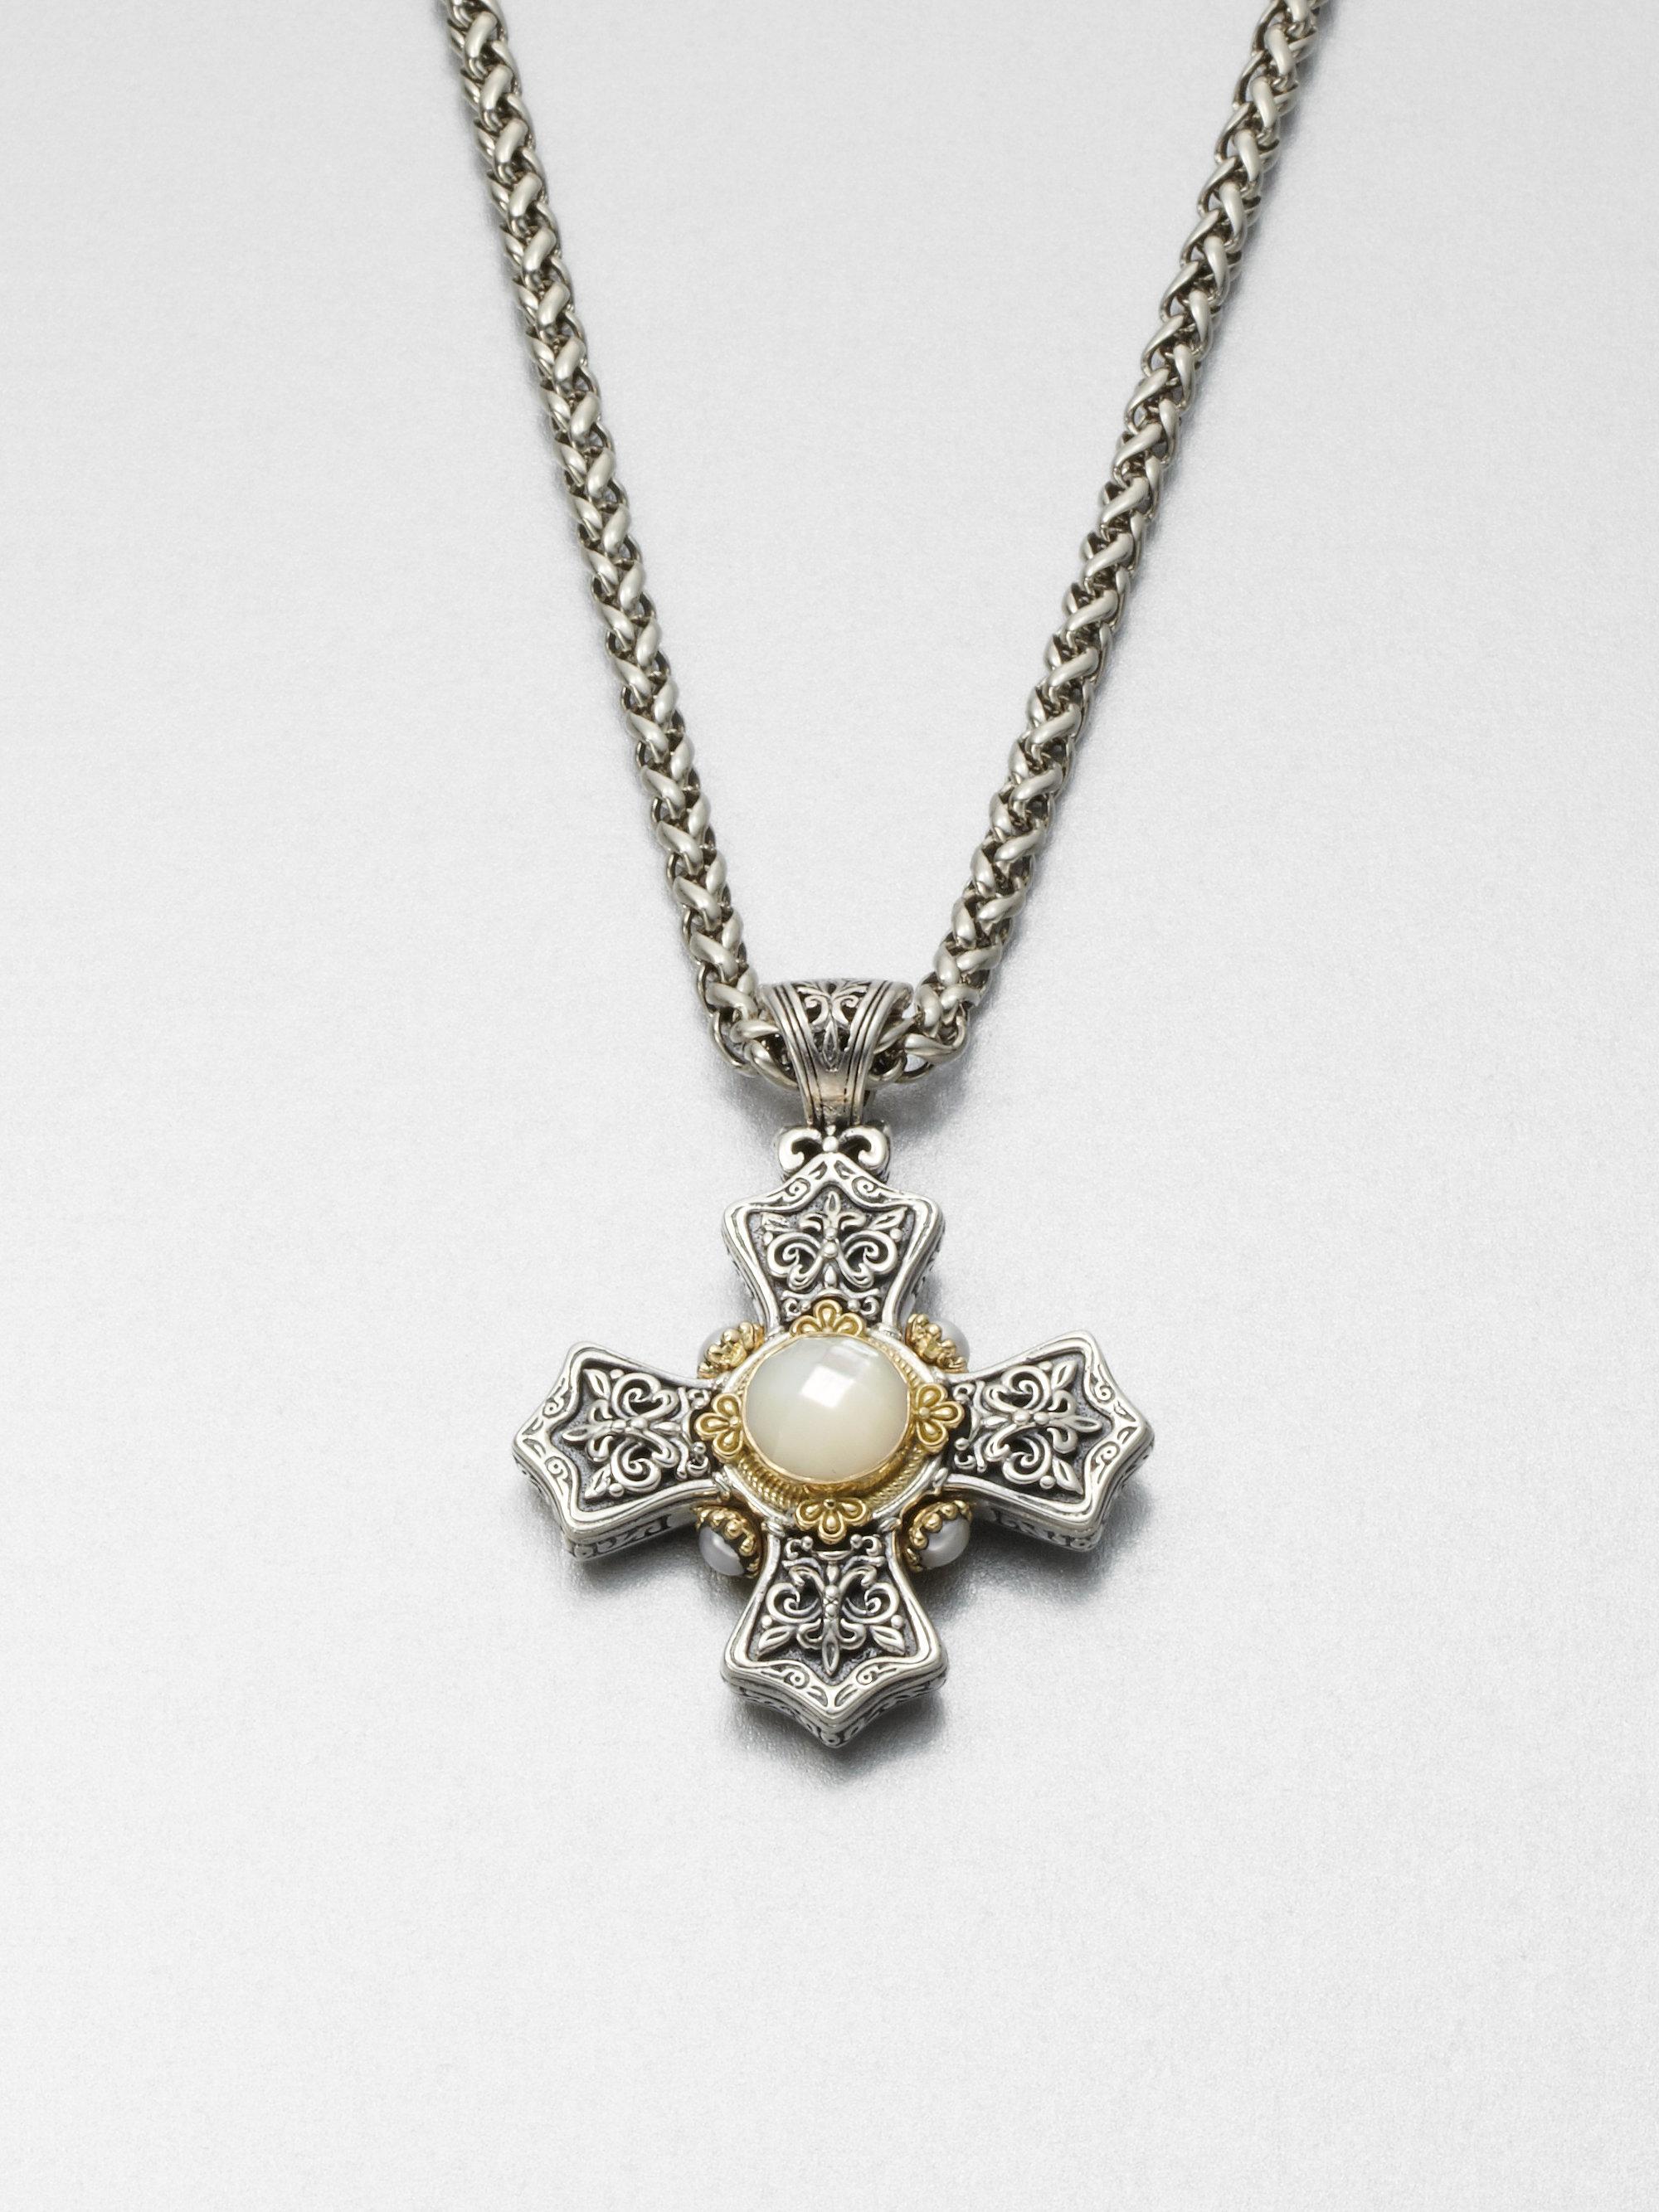 Konstantino Motherofpearl 18k Gold Sterling Silver Cross Pendant